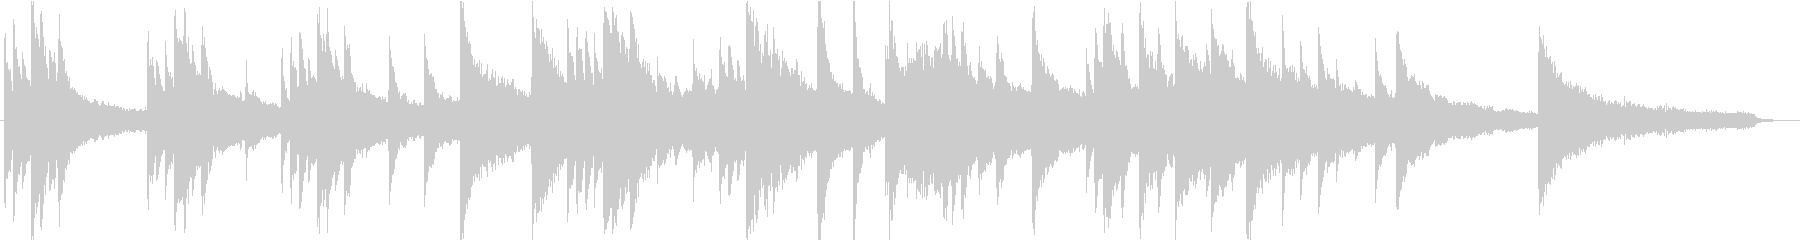 CM・企業VP用、60秒尺のピアノ楽曲の未再生の波形